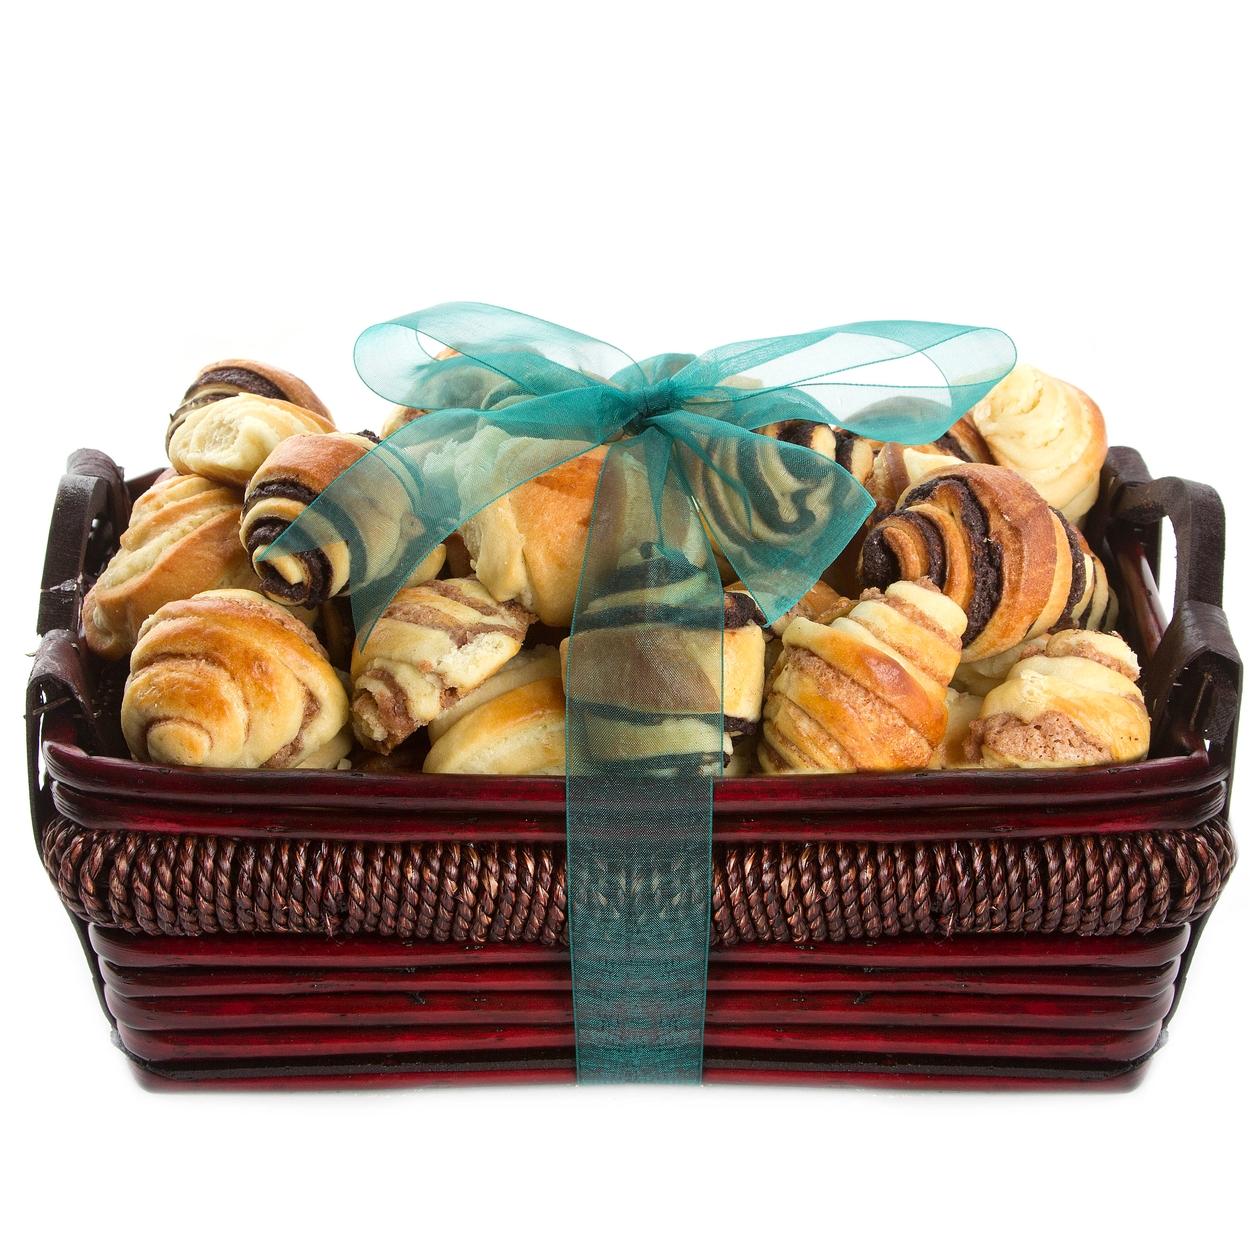 Medium Rugelach Gift Basket • Bakery Fresh Rugelach & Babka ...